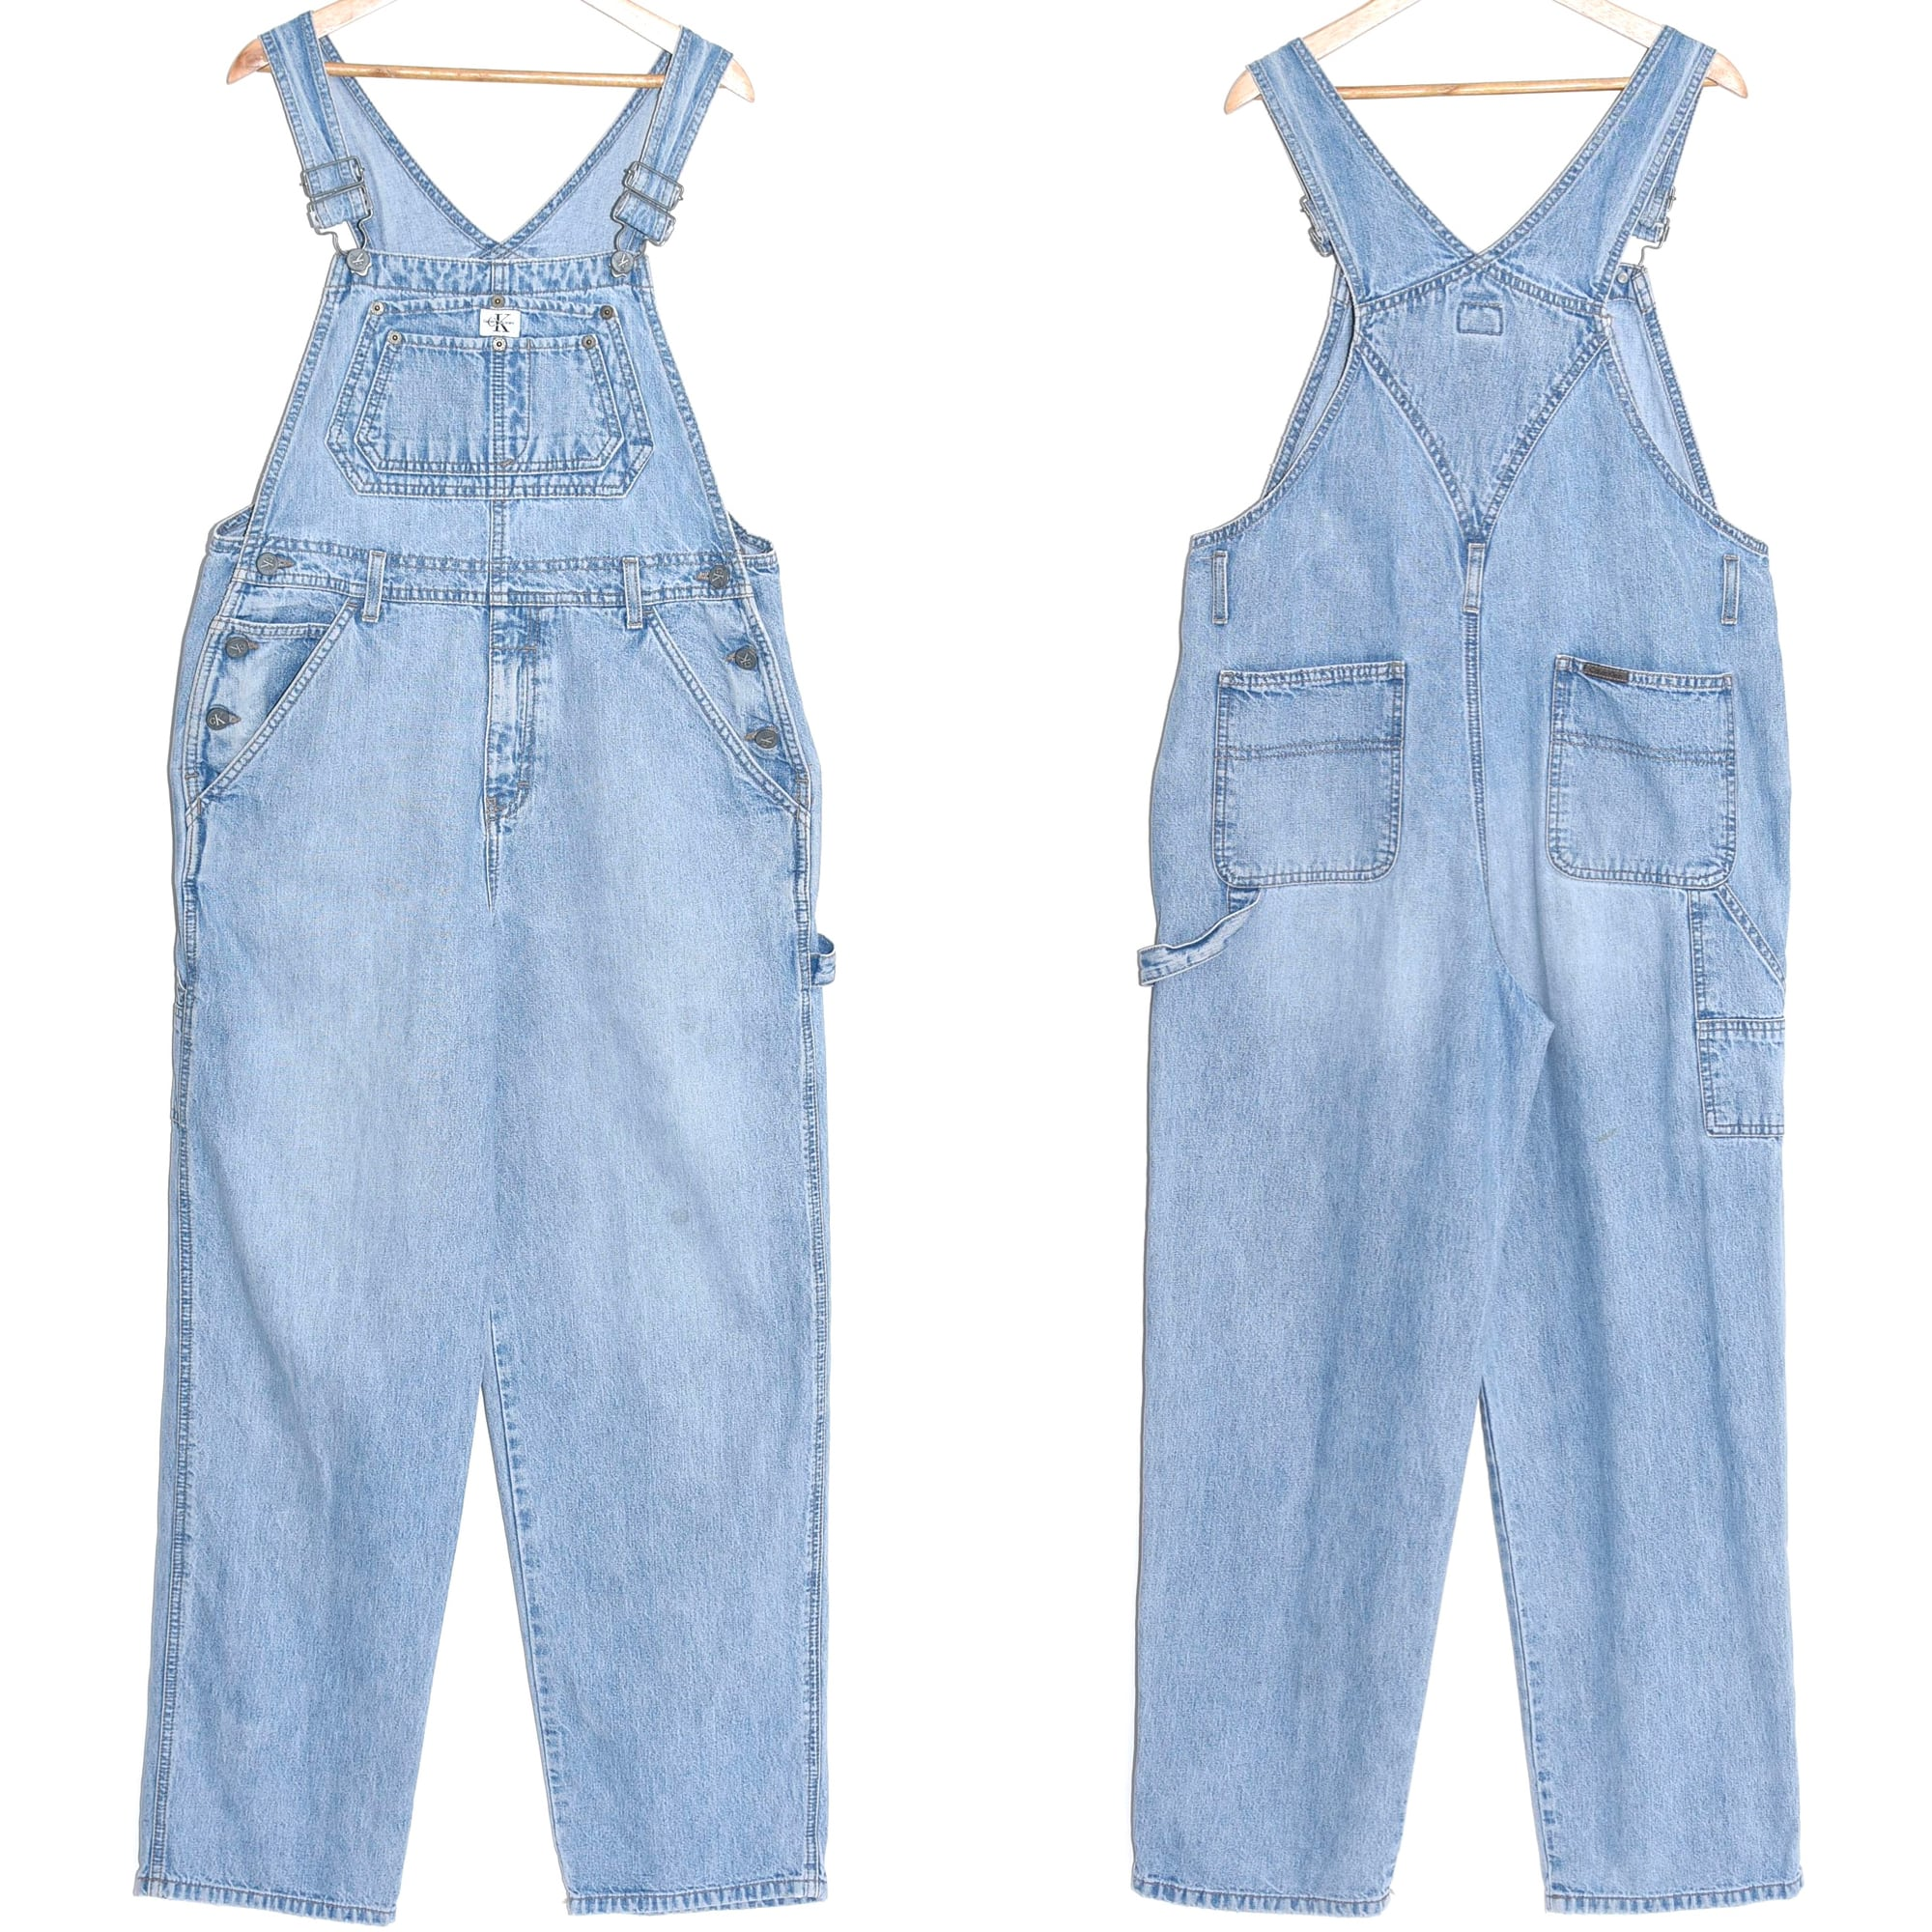 90's Calvin Klein denim overall Made in USA